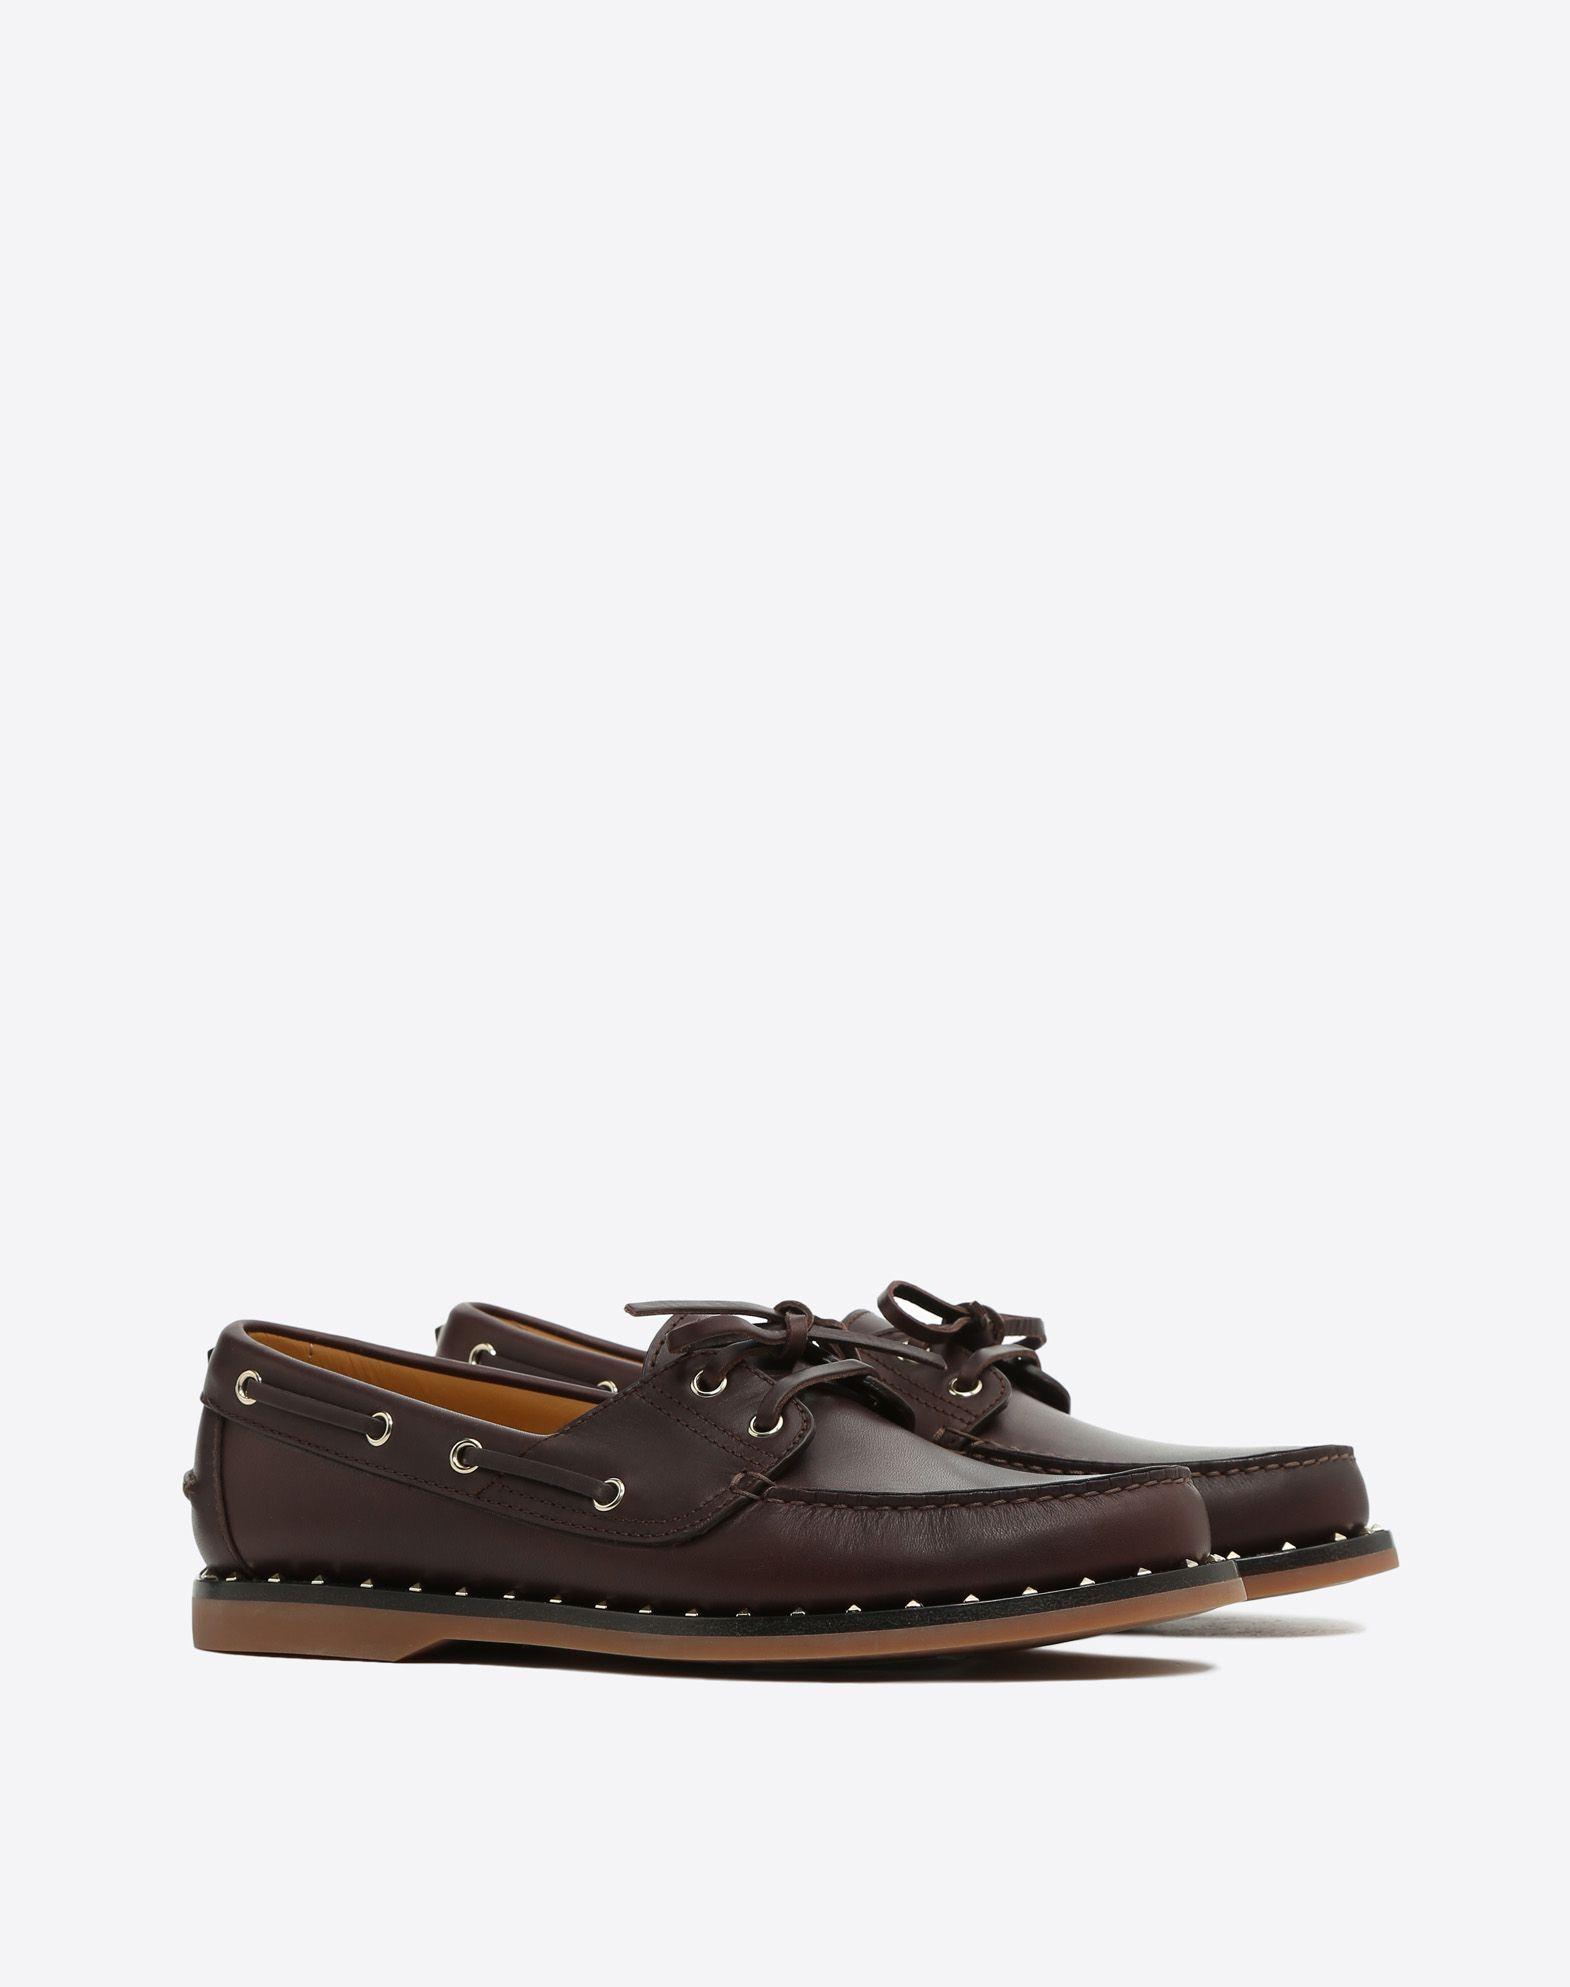 VALENTINO GARAVANI UOMO Soul Rockstud Boat shoes LOAFERS U r